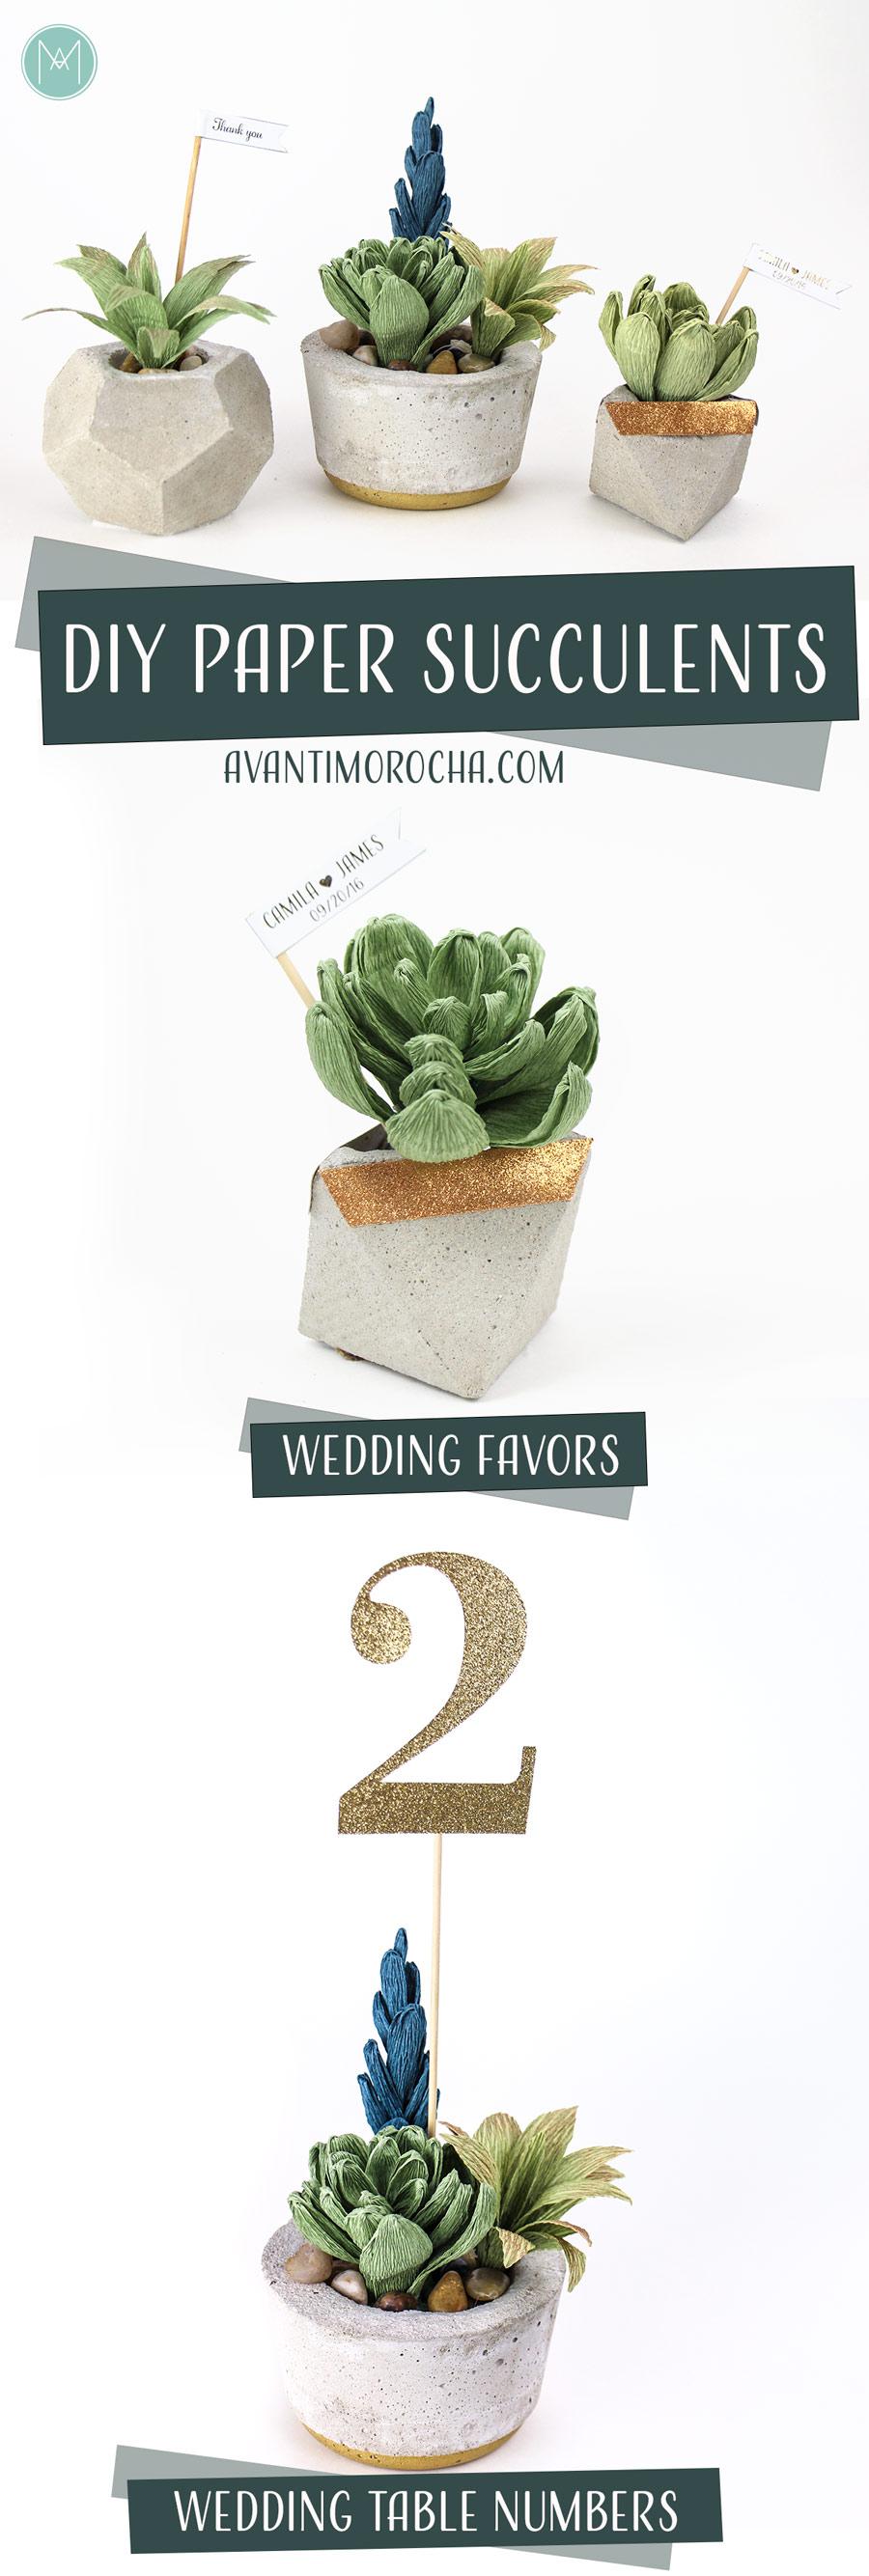 DIY Crepe Paper Succulents